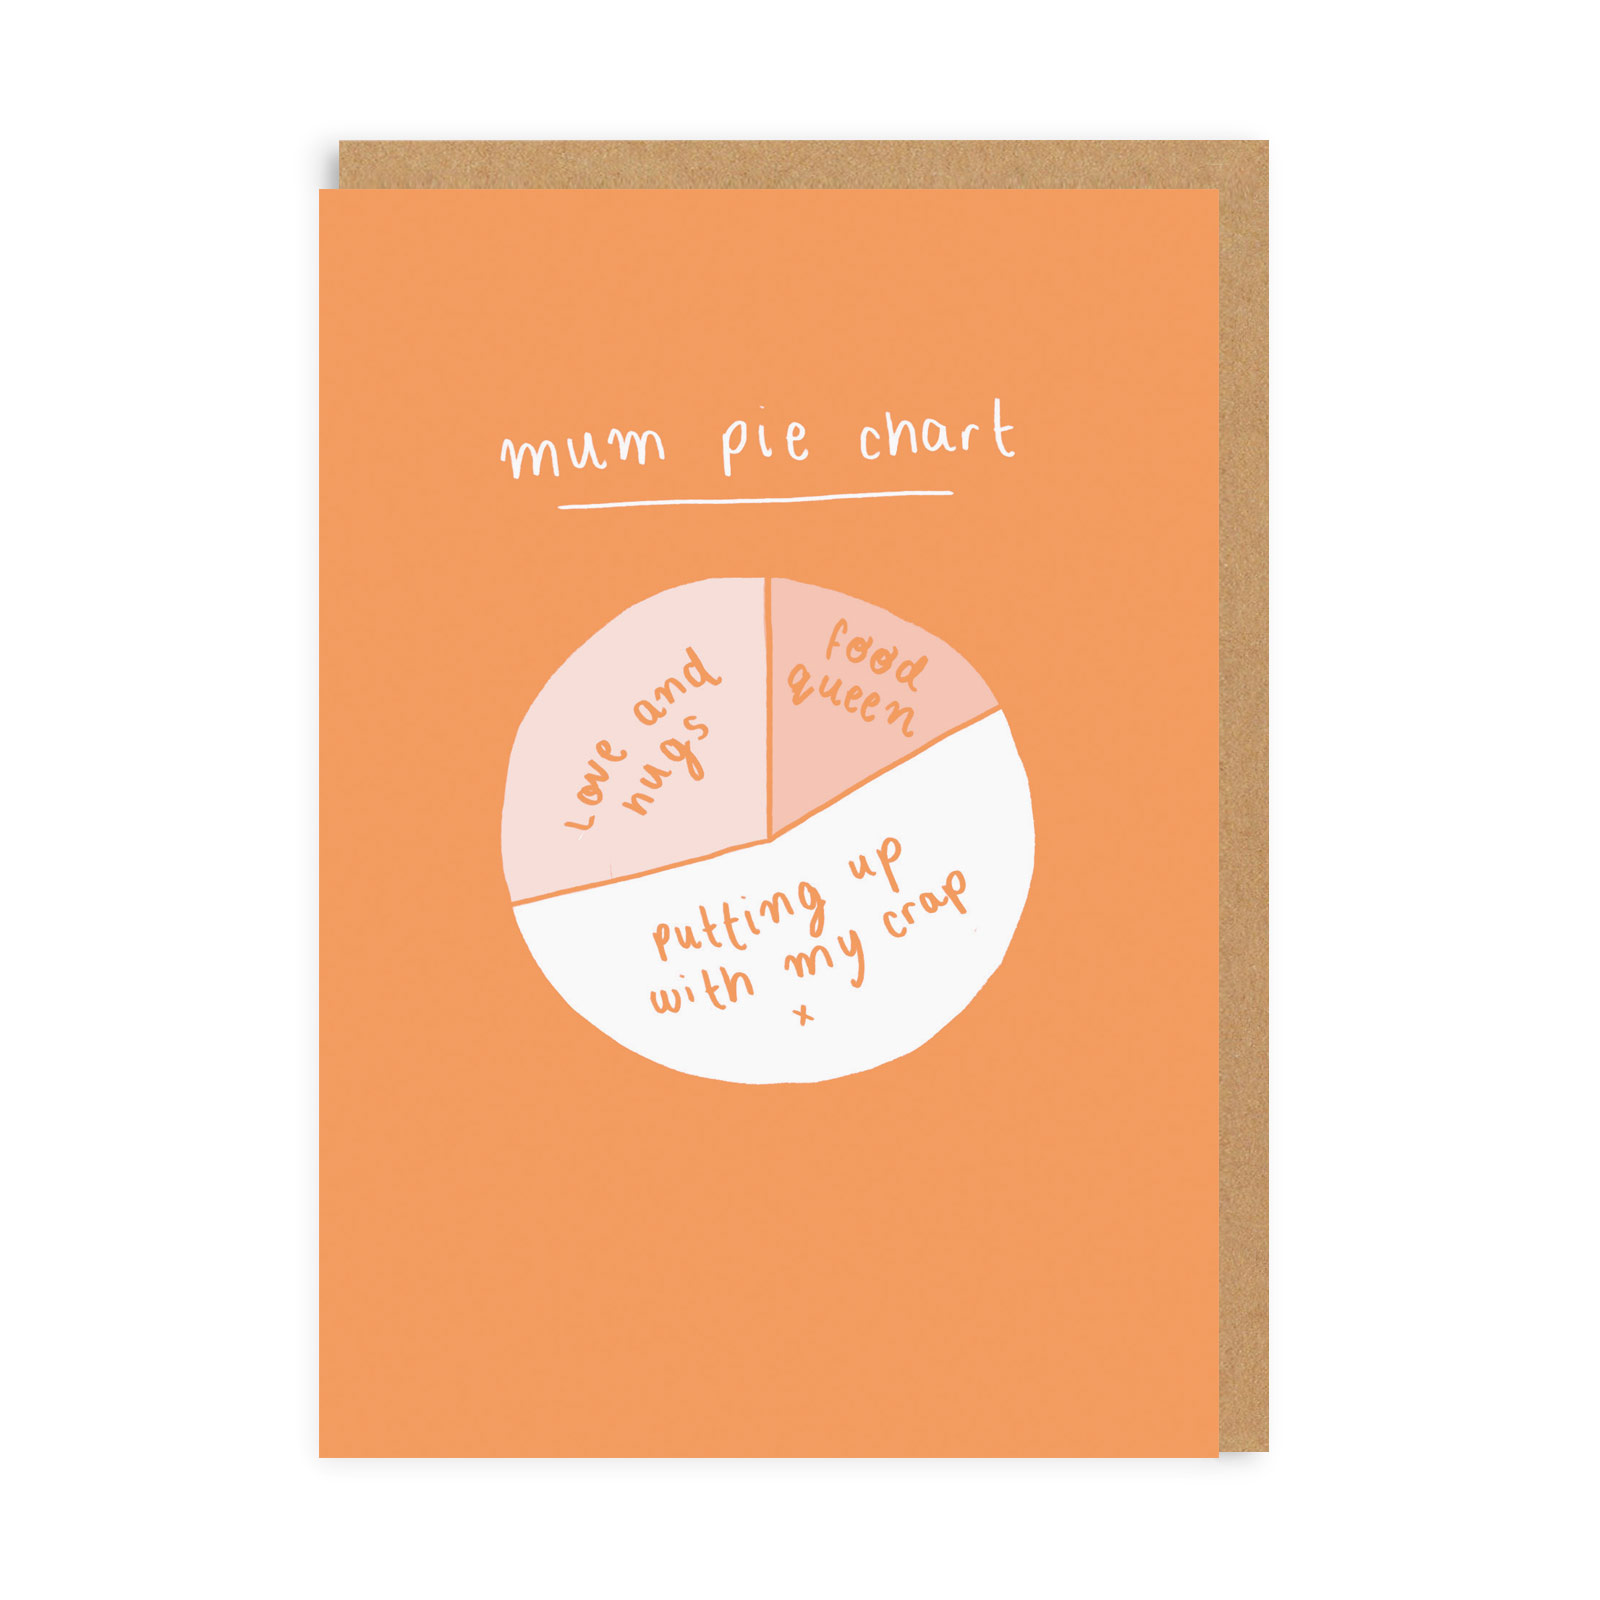 ALE-GC-3368-A6 Mum Pie Chart.jpg